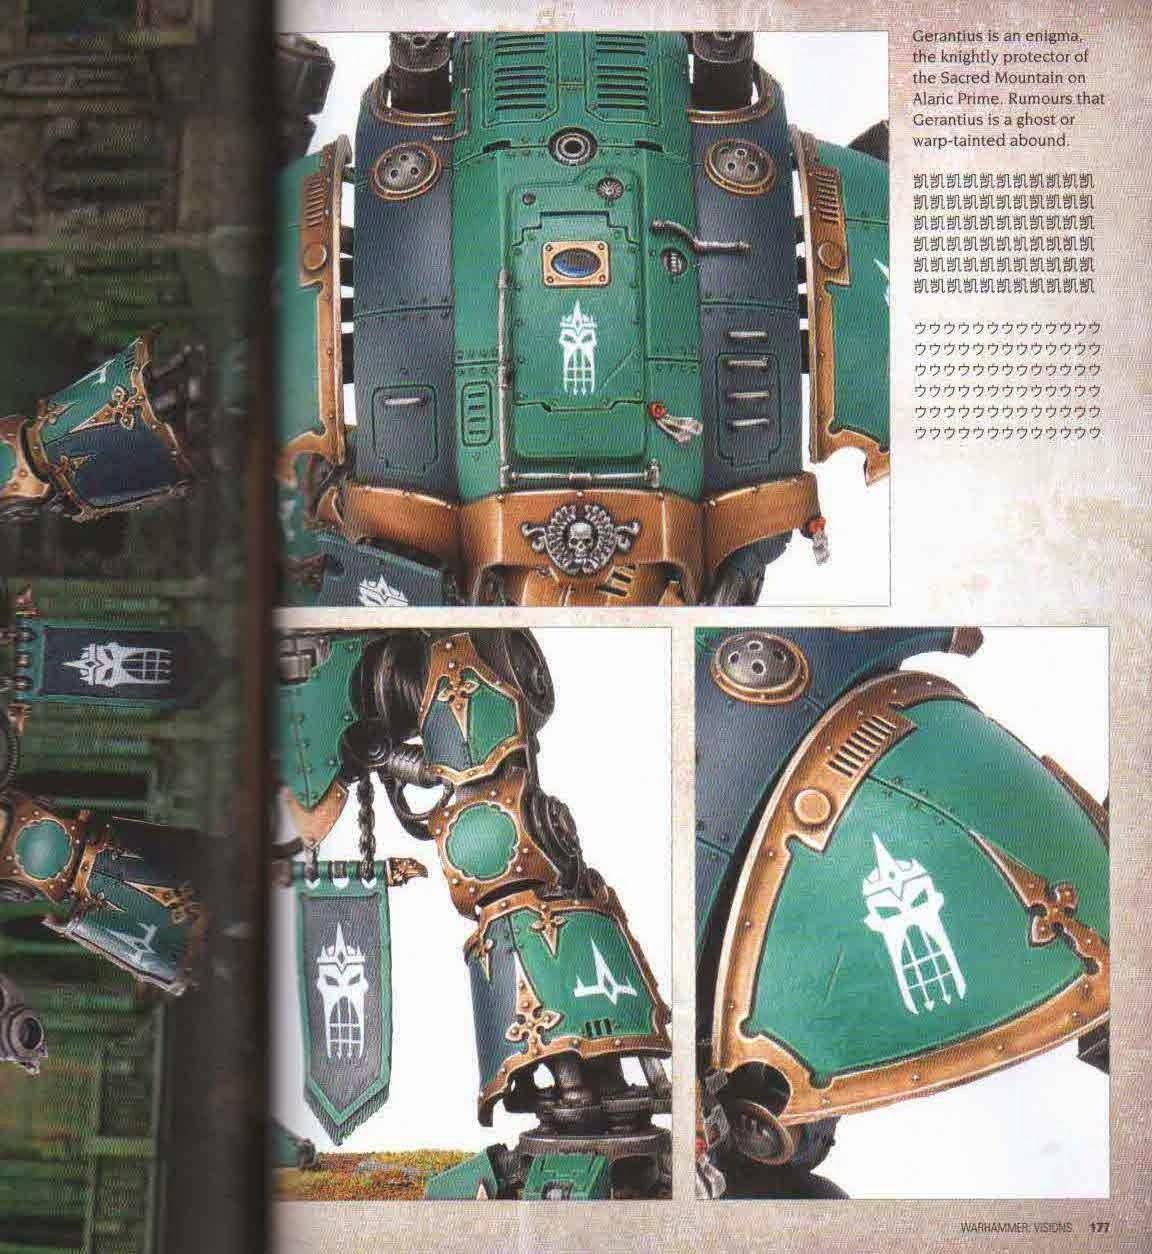 Errores Warhammer: Visions, número 3, página 177